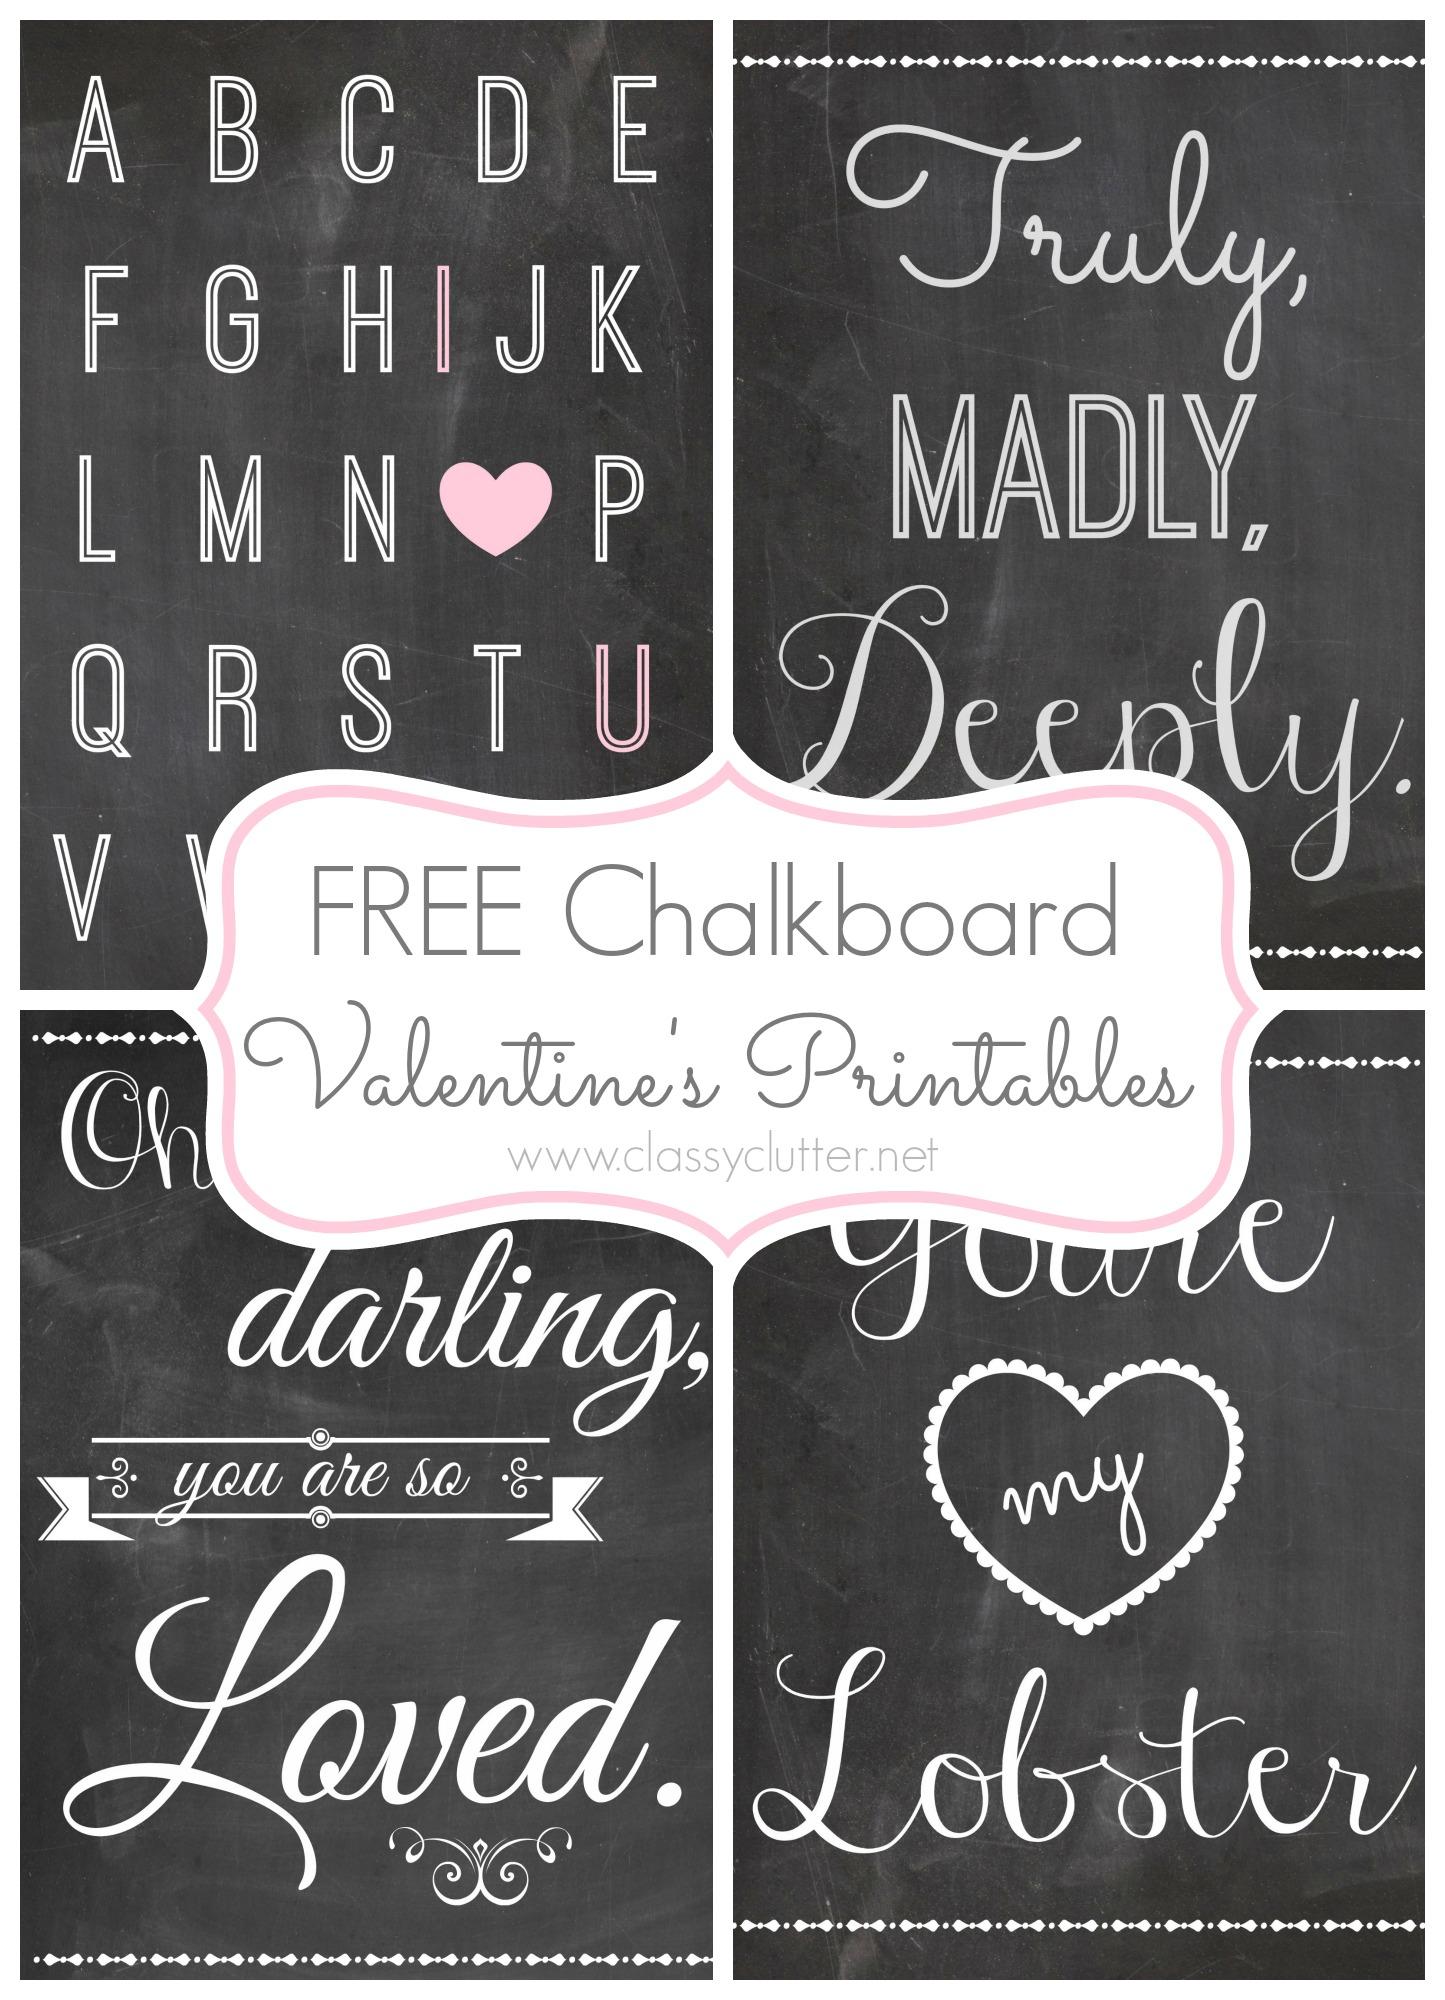 5 Images of Free Printable Valentine Chalkboard